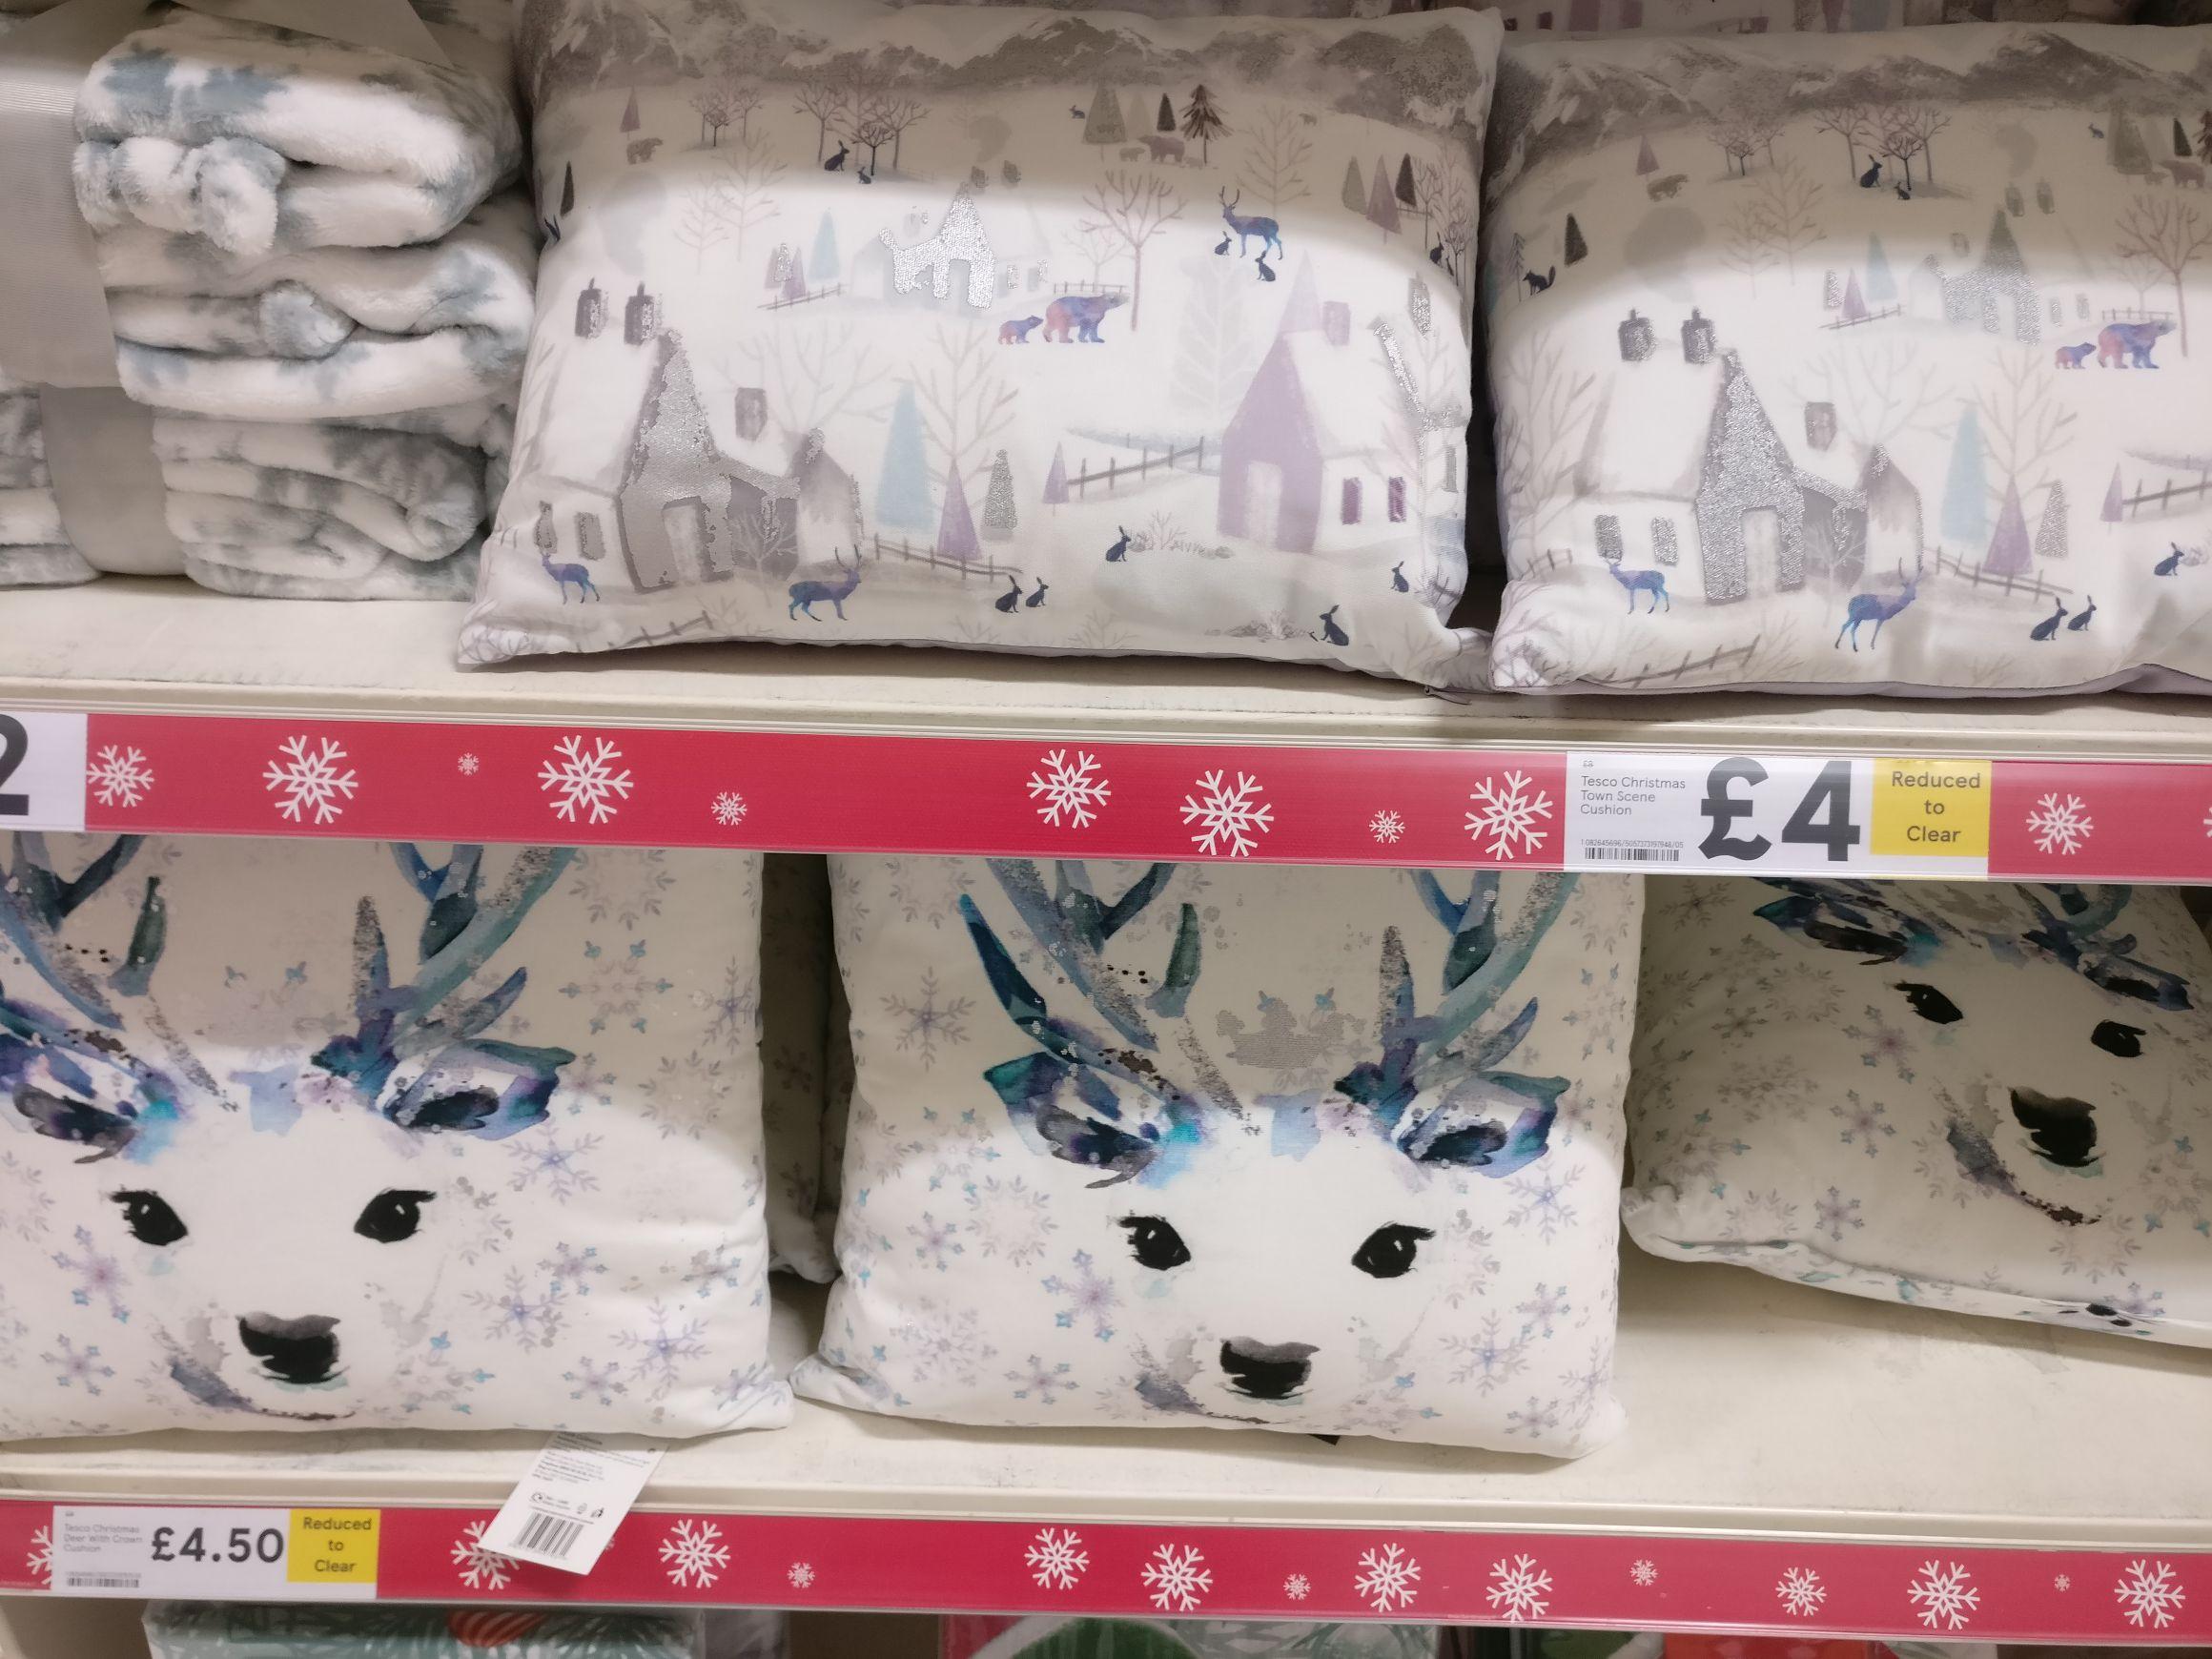 Half price deer and snow scene cushions - £4 / £4.50 @ Tesco instore